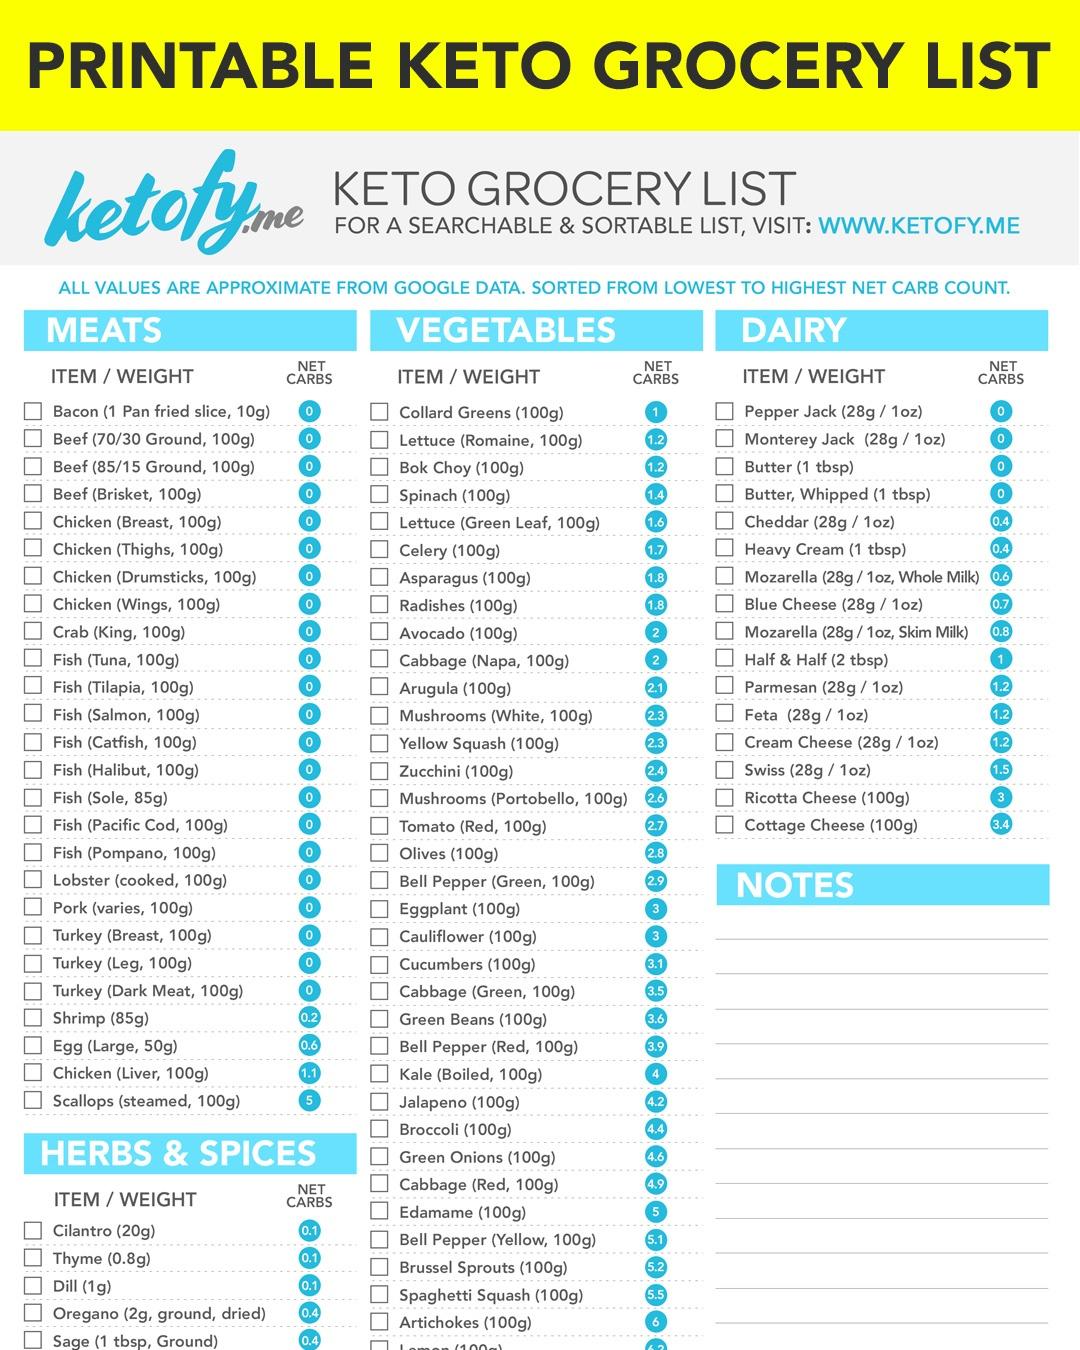 Keto ~ Fy Me | Cut Carbs, Not Flavor! • Ketogenic Diet Grocery List - Free Printable Keto Food List